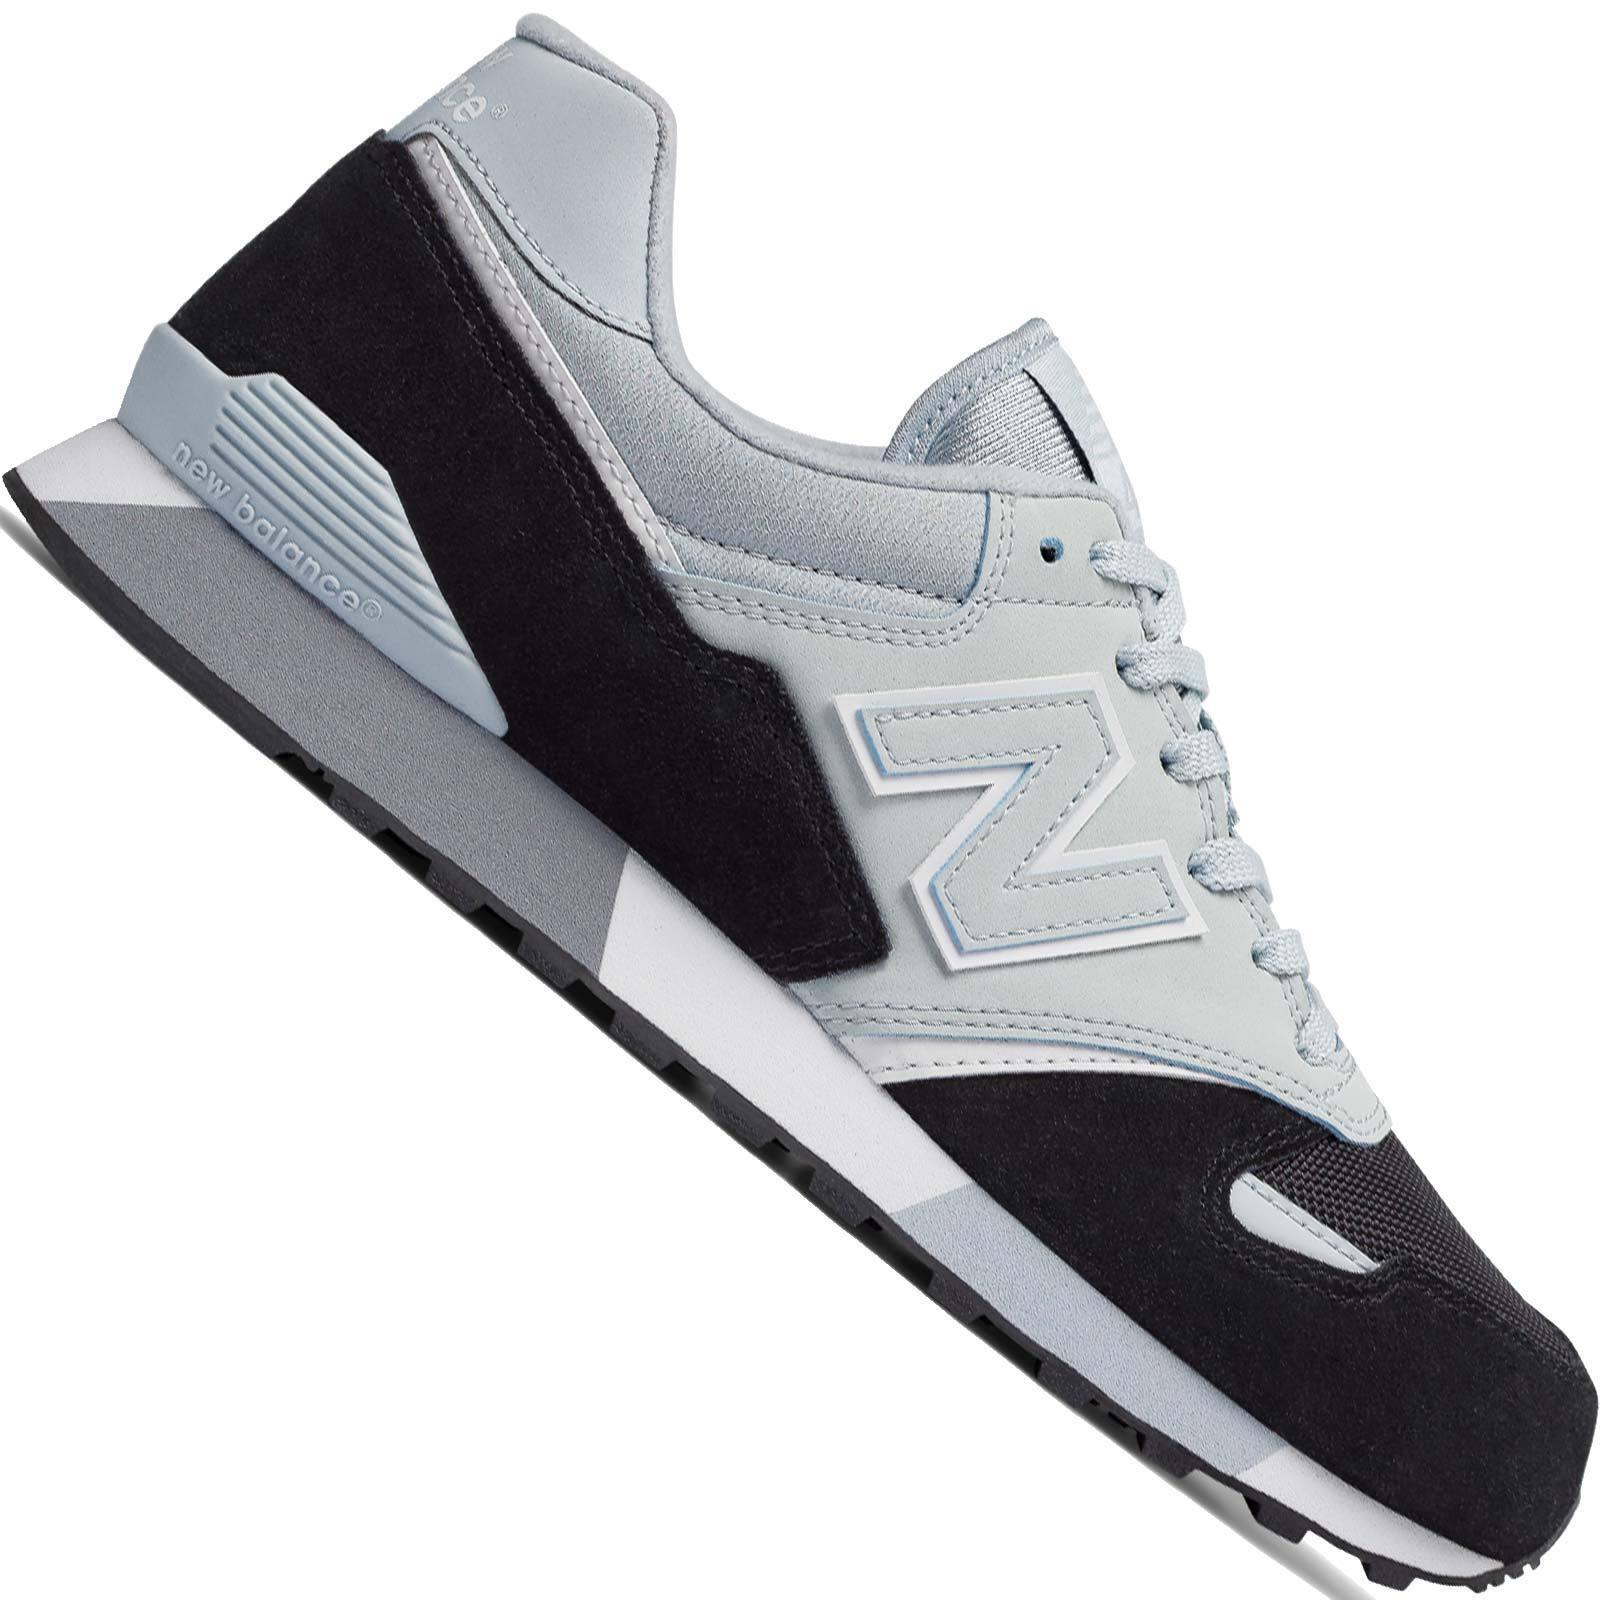 NEW Balance 446 Uomo-scarpe da ginnastica scarpe da da da ginnastica Scarpe Sportive Scarpe da Uomo Nuovo Scarpe | Economico E Pratico  6d5ee3